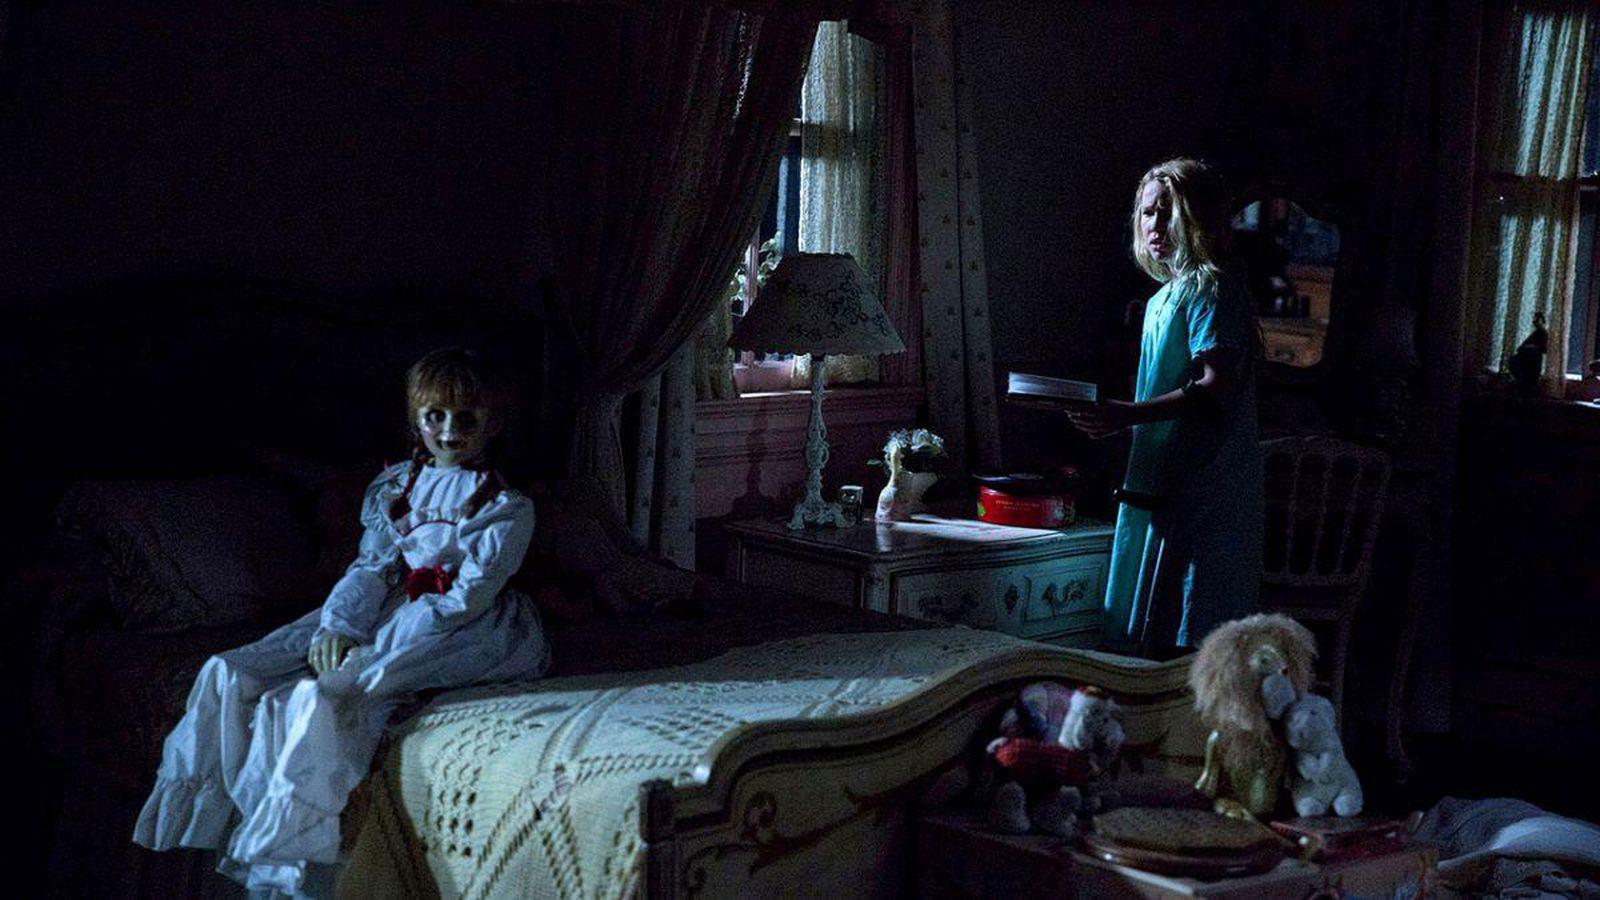 Annabelle: Creation - Đi đêm lắm có ngày gặp ma - Ảnh 3.